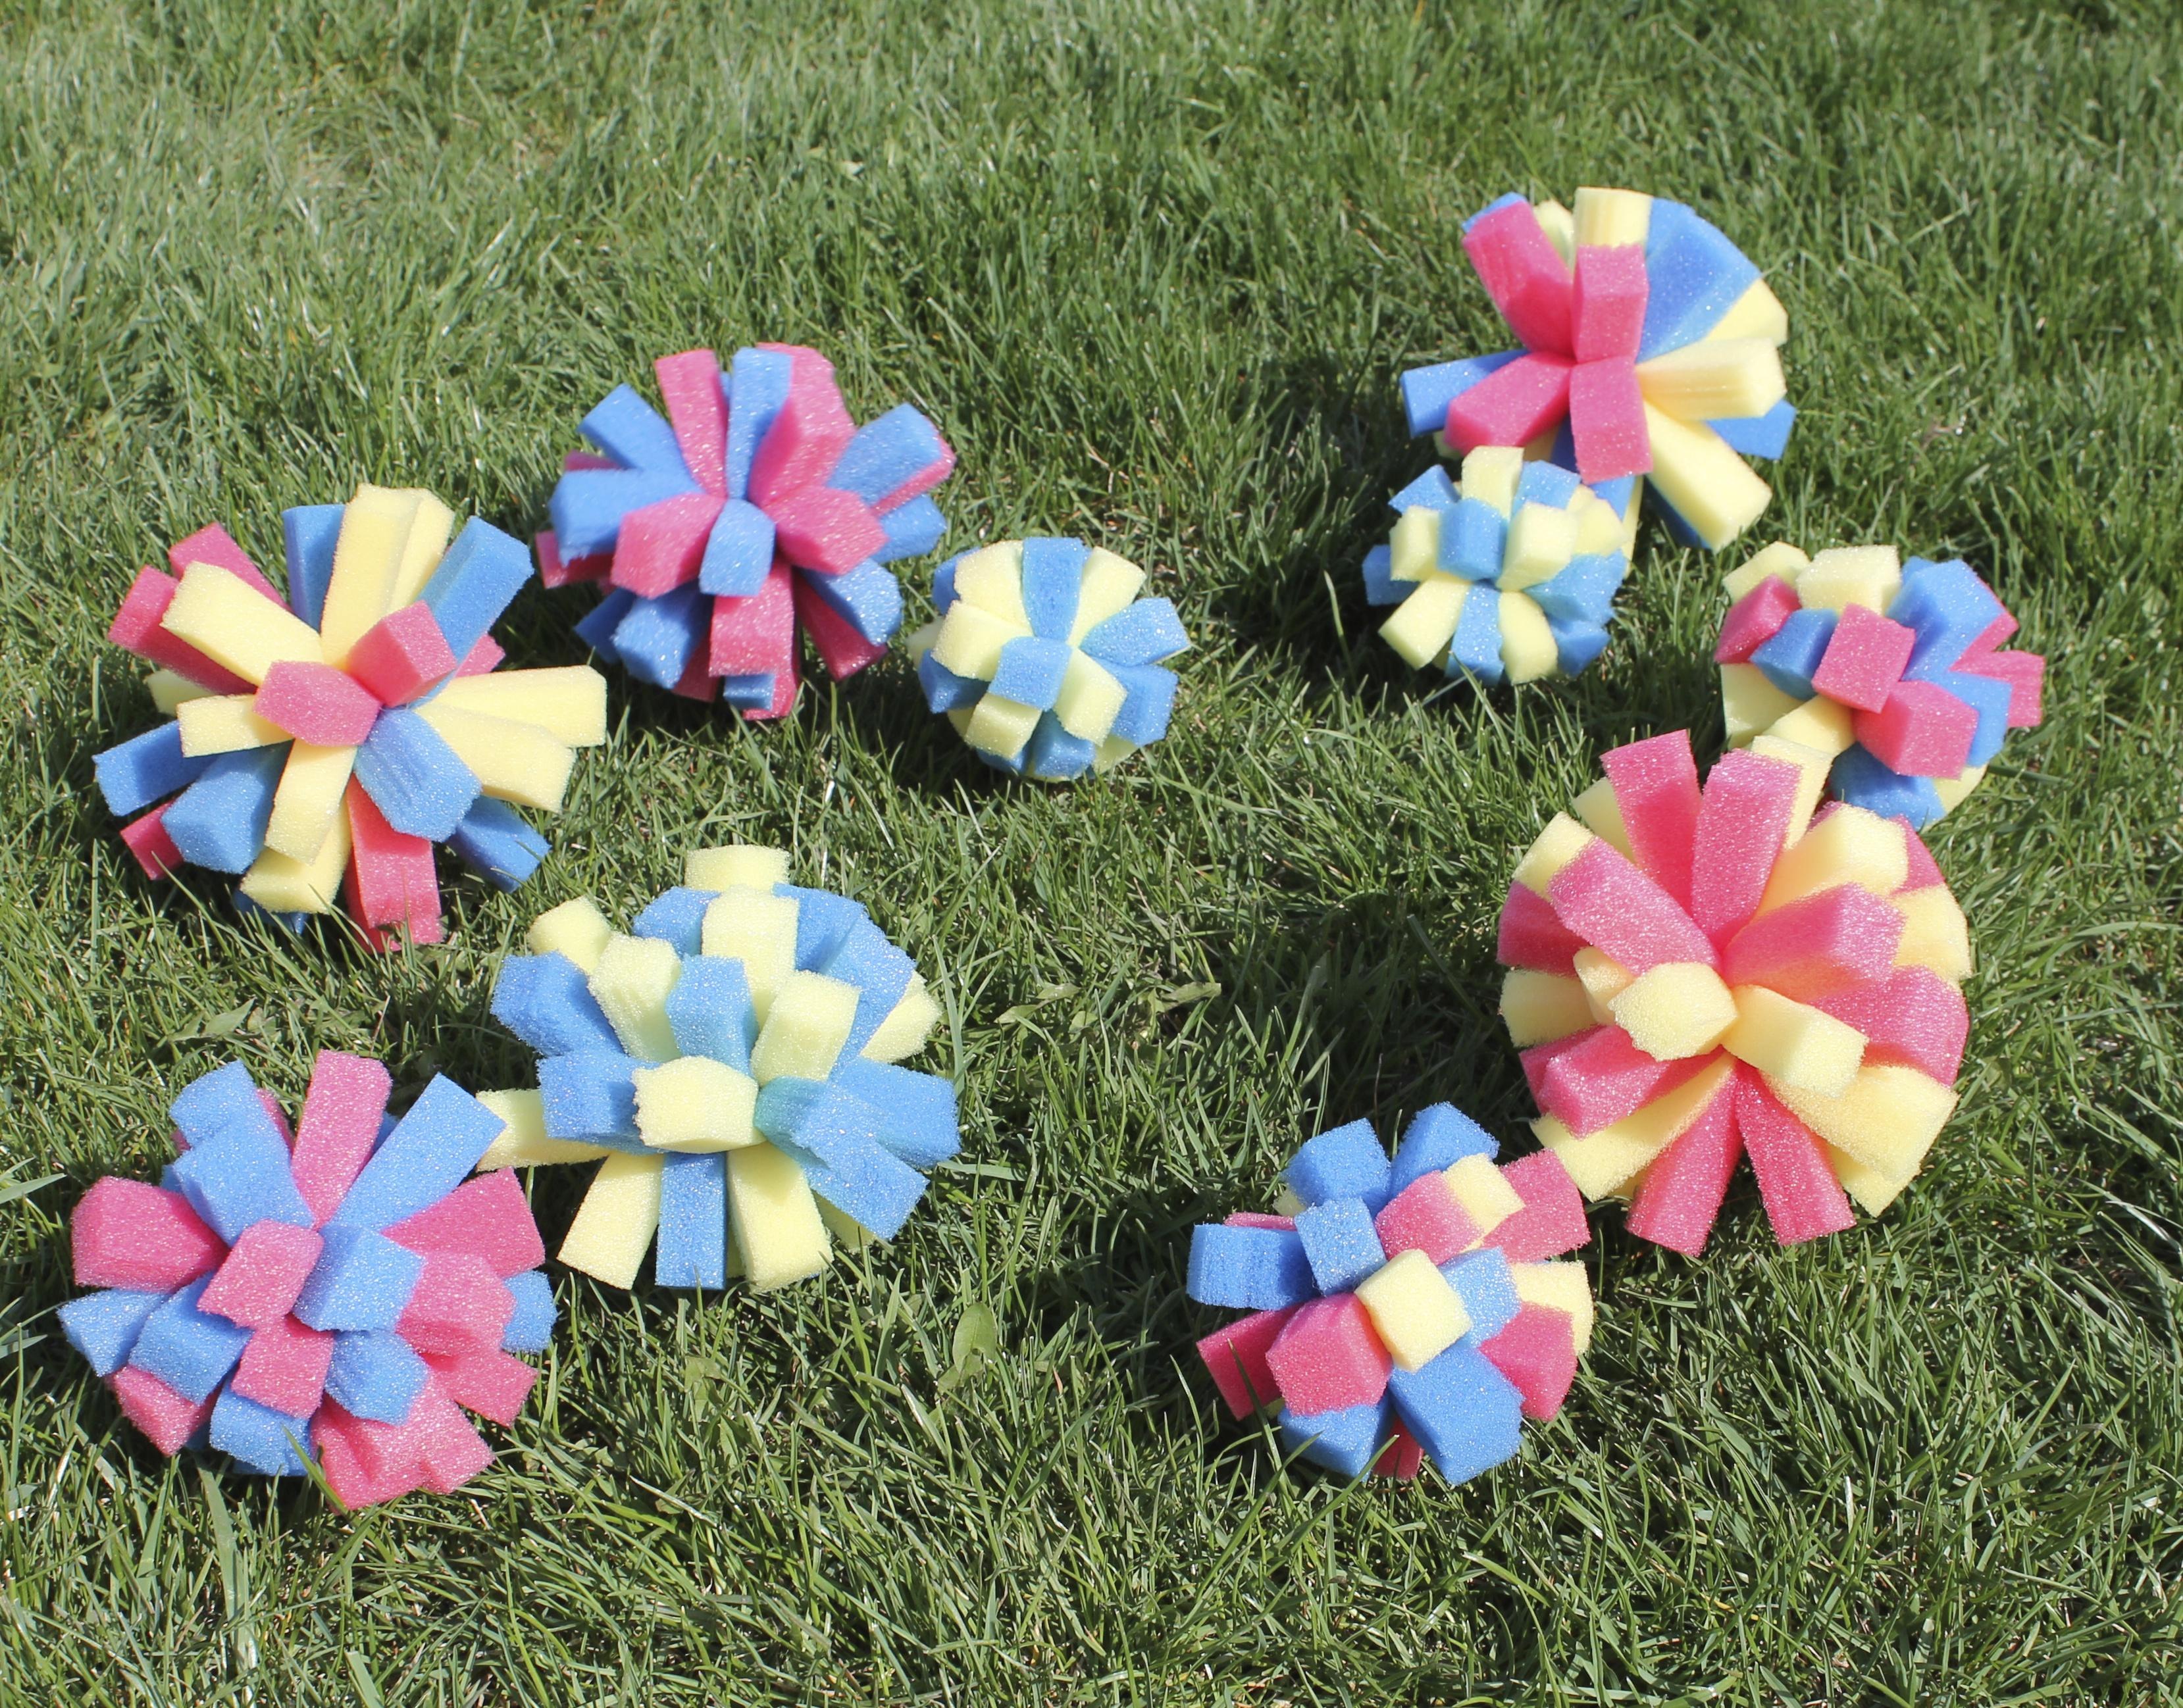 Reusable Water Balloons